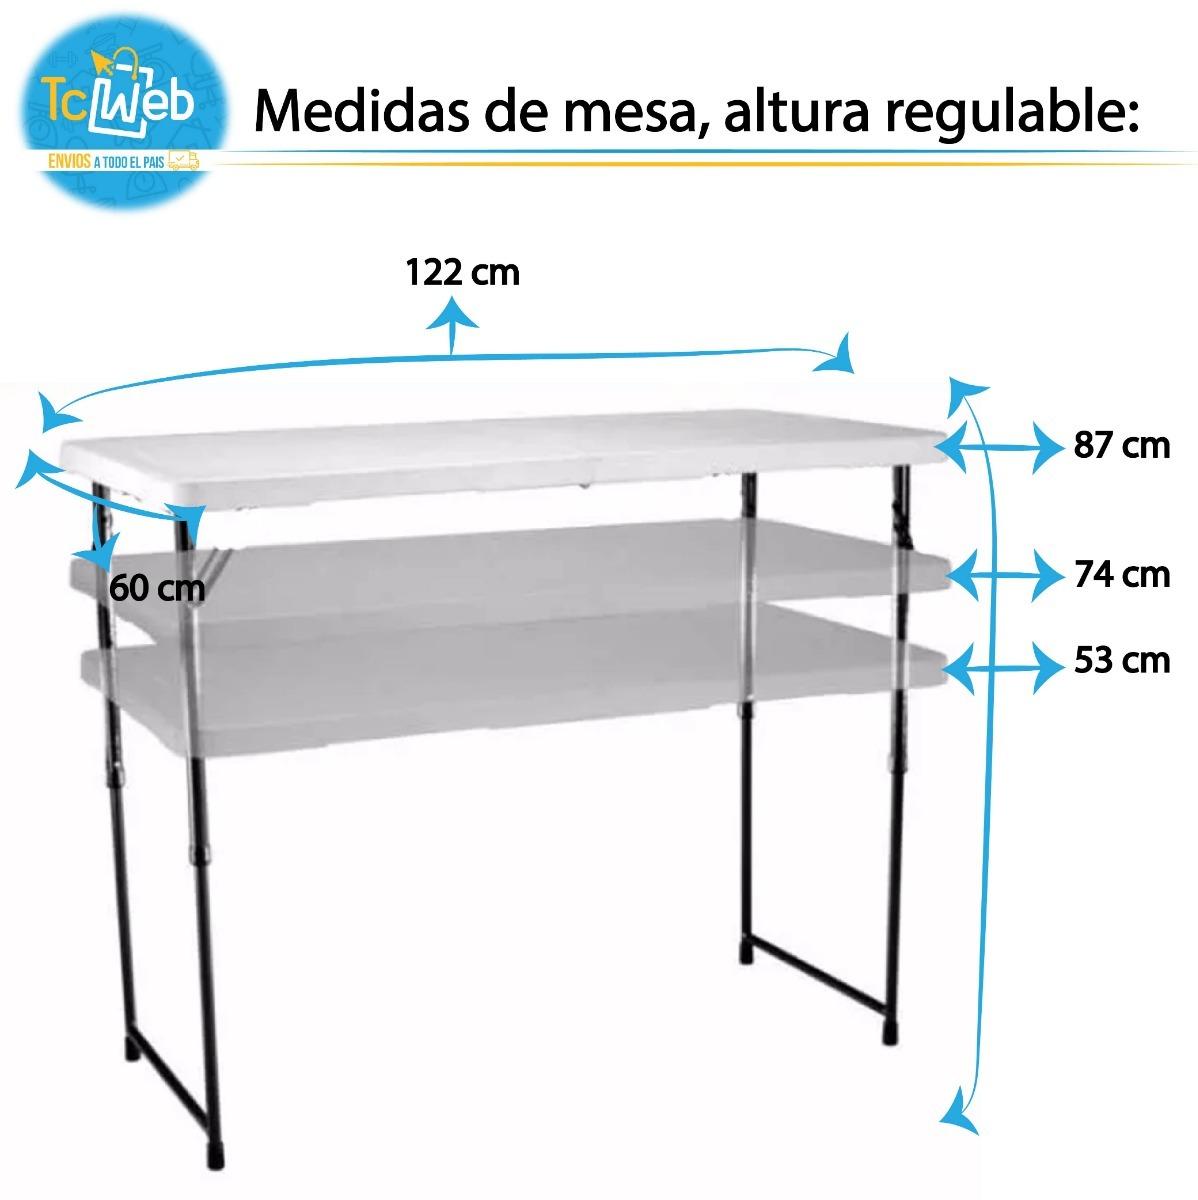 Plegable Alturas Regulable Mesa Polipropileno 3 We9ID2YEH